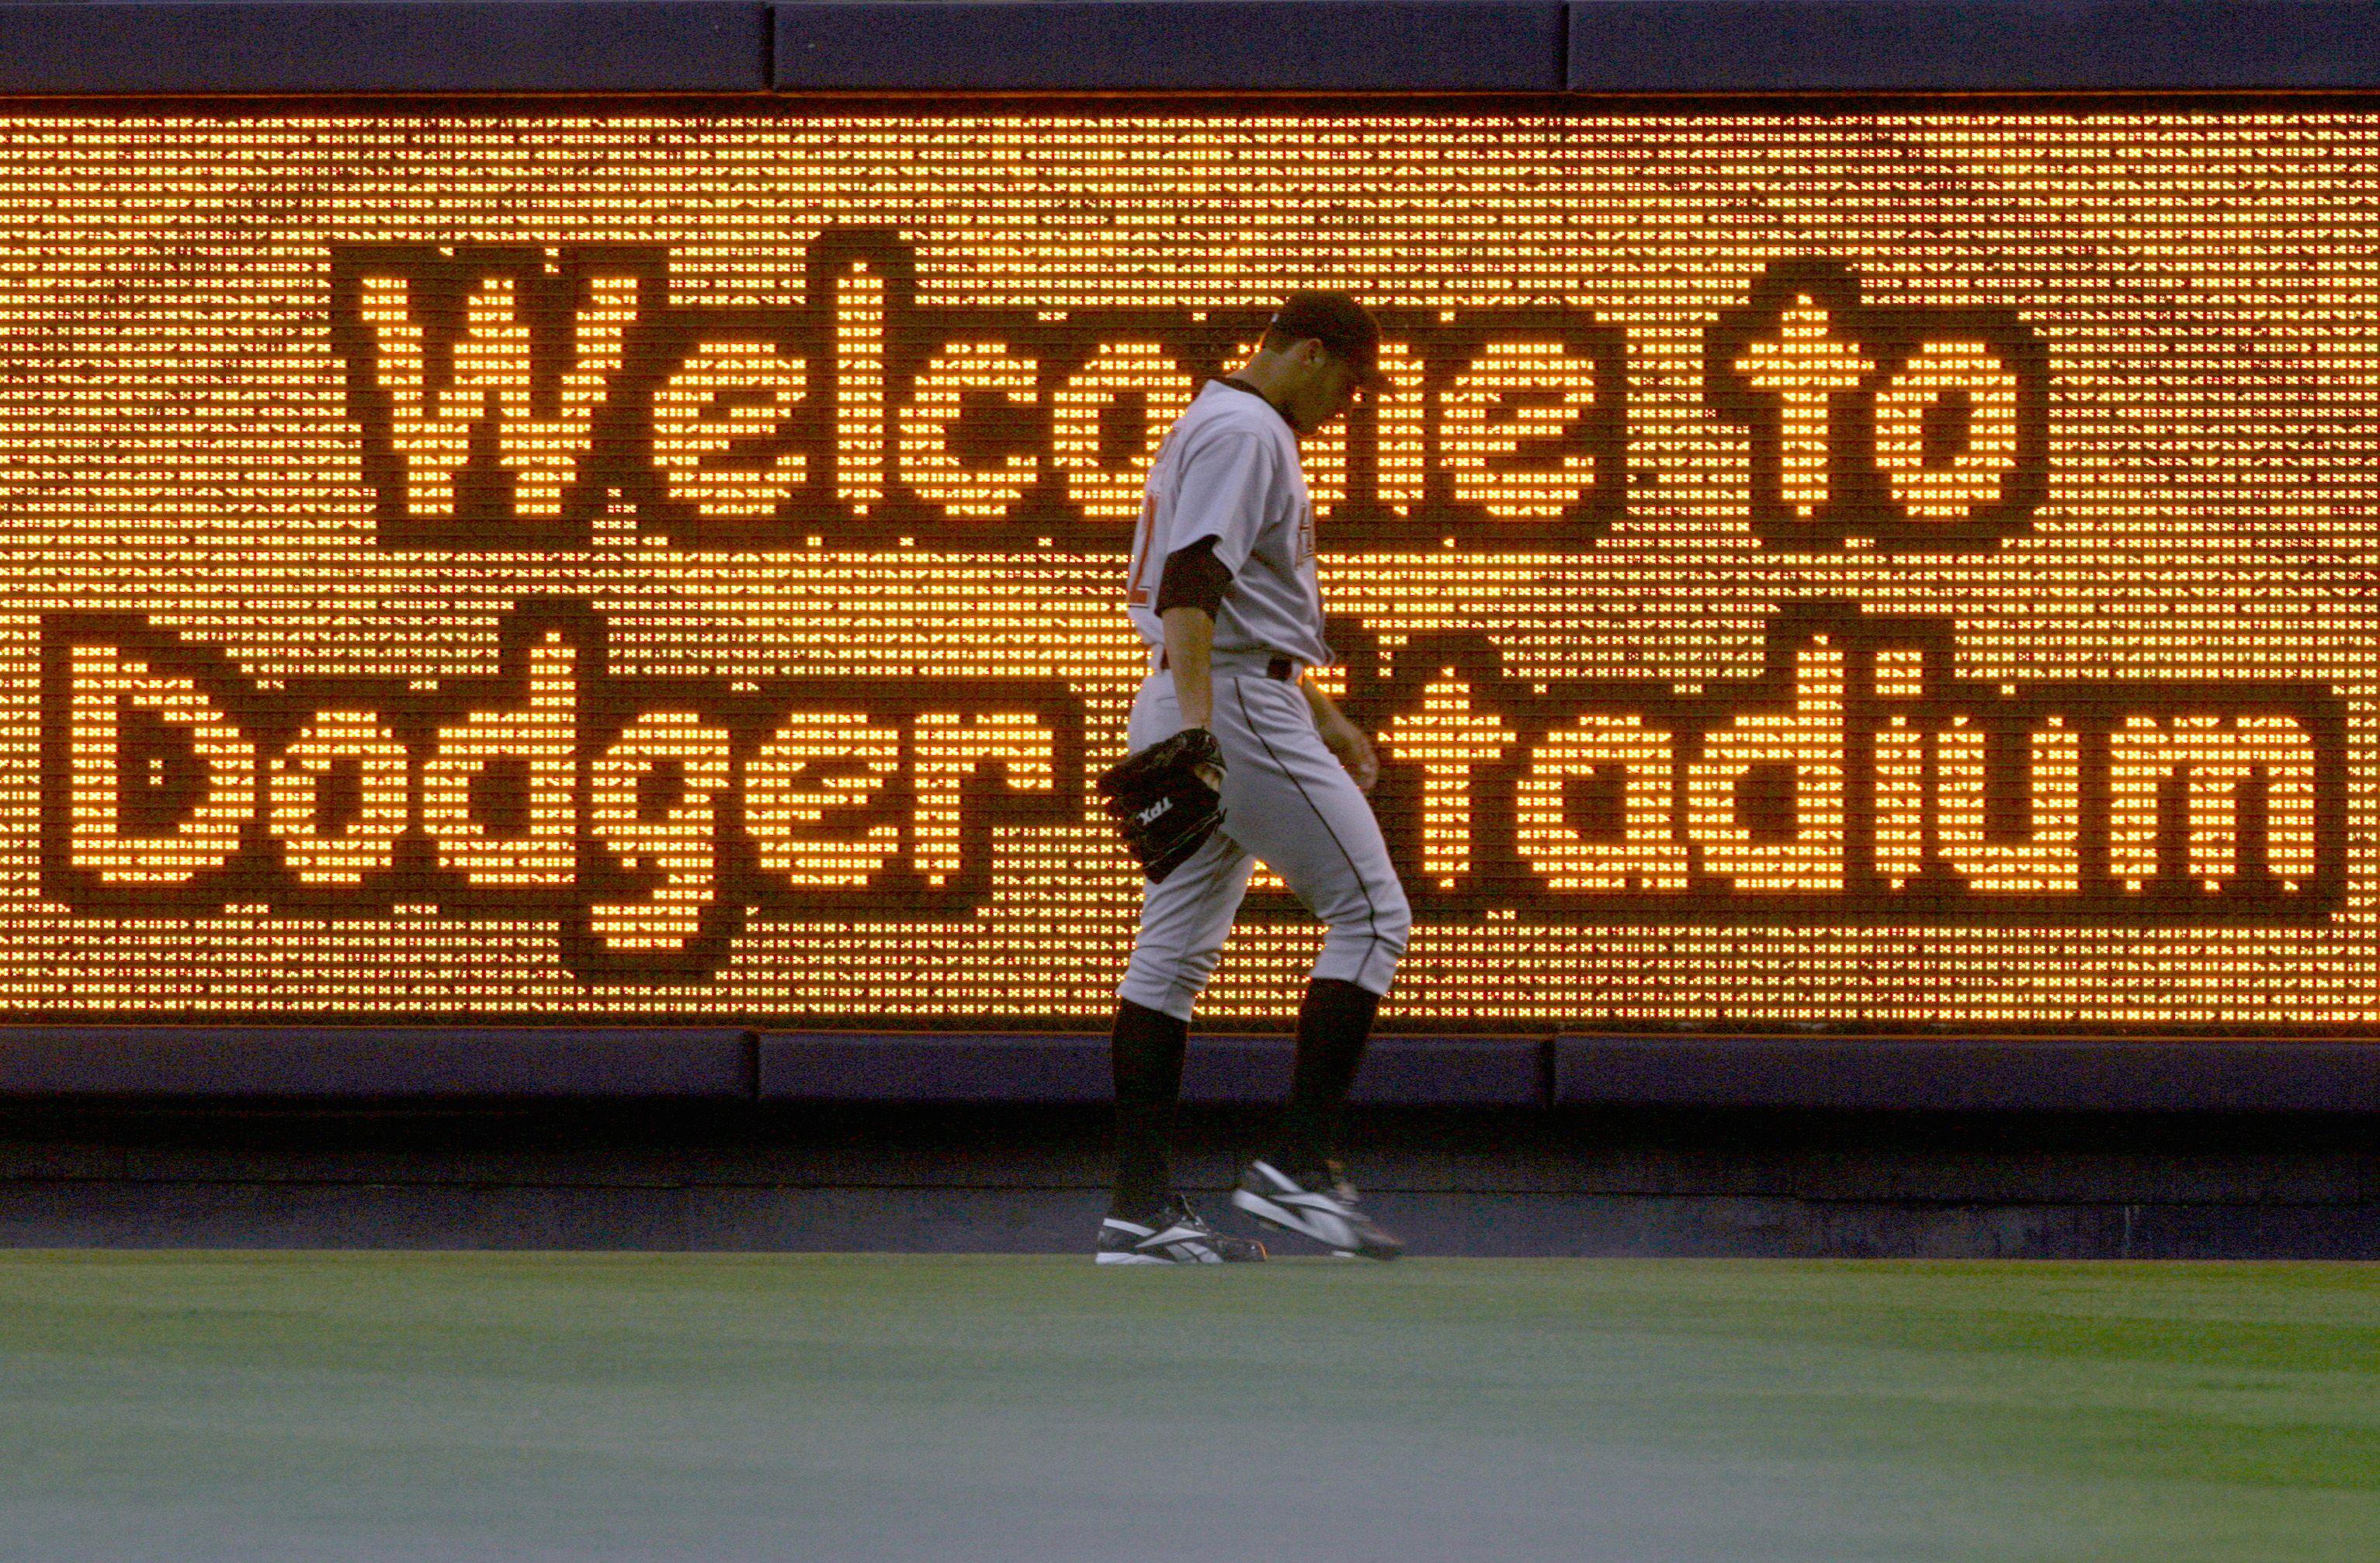 The Ribbon Board at Dodger Stadium